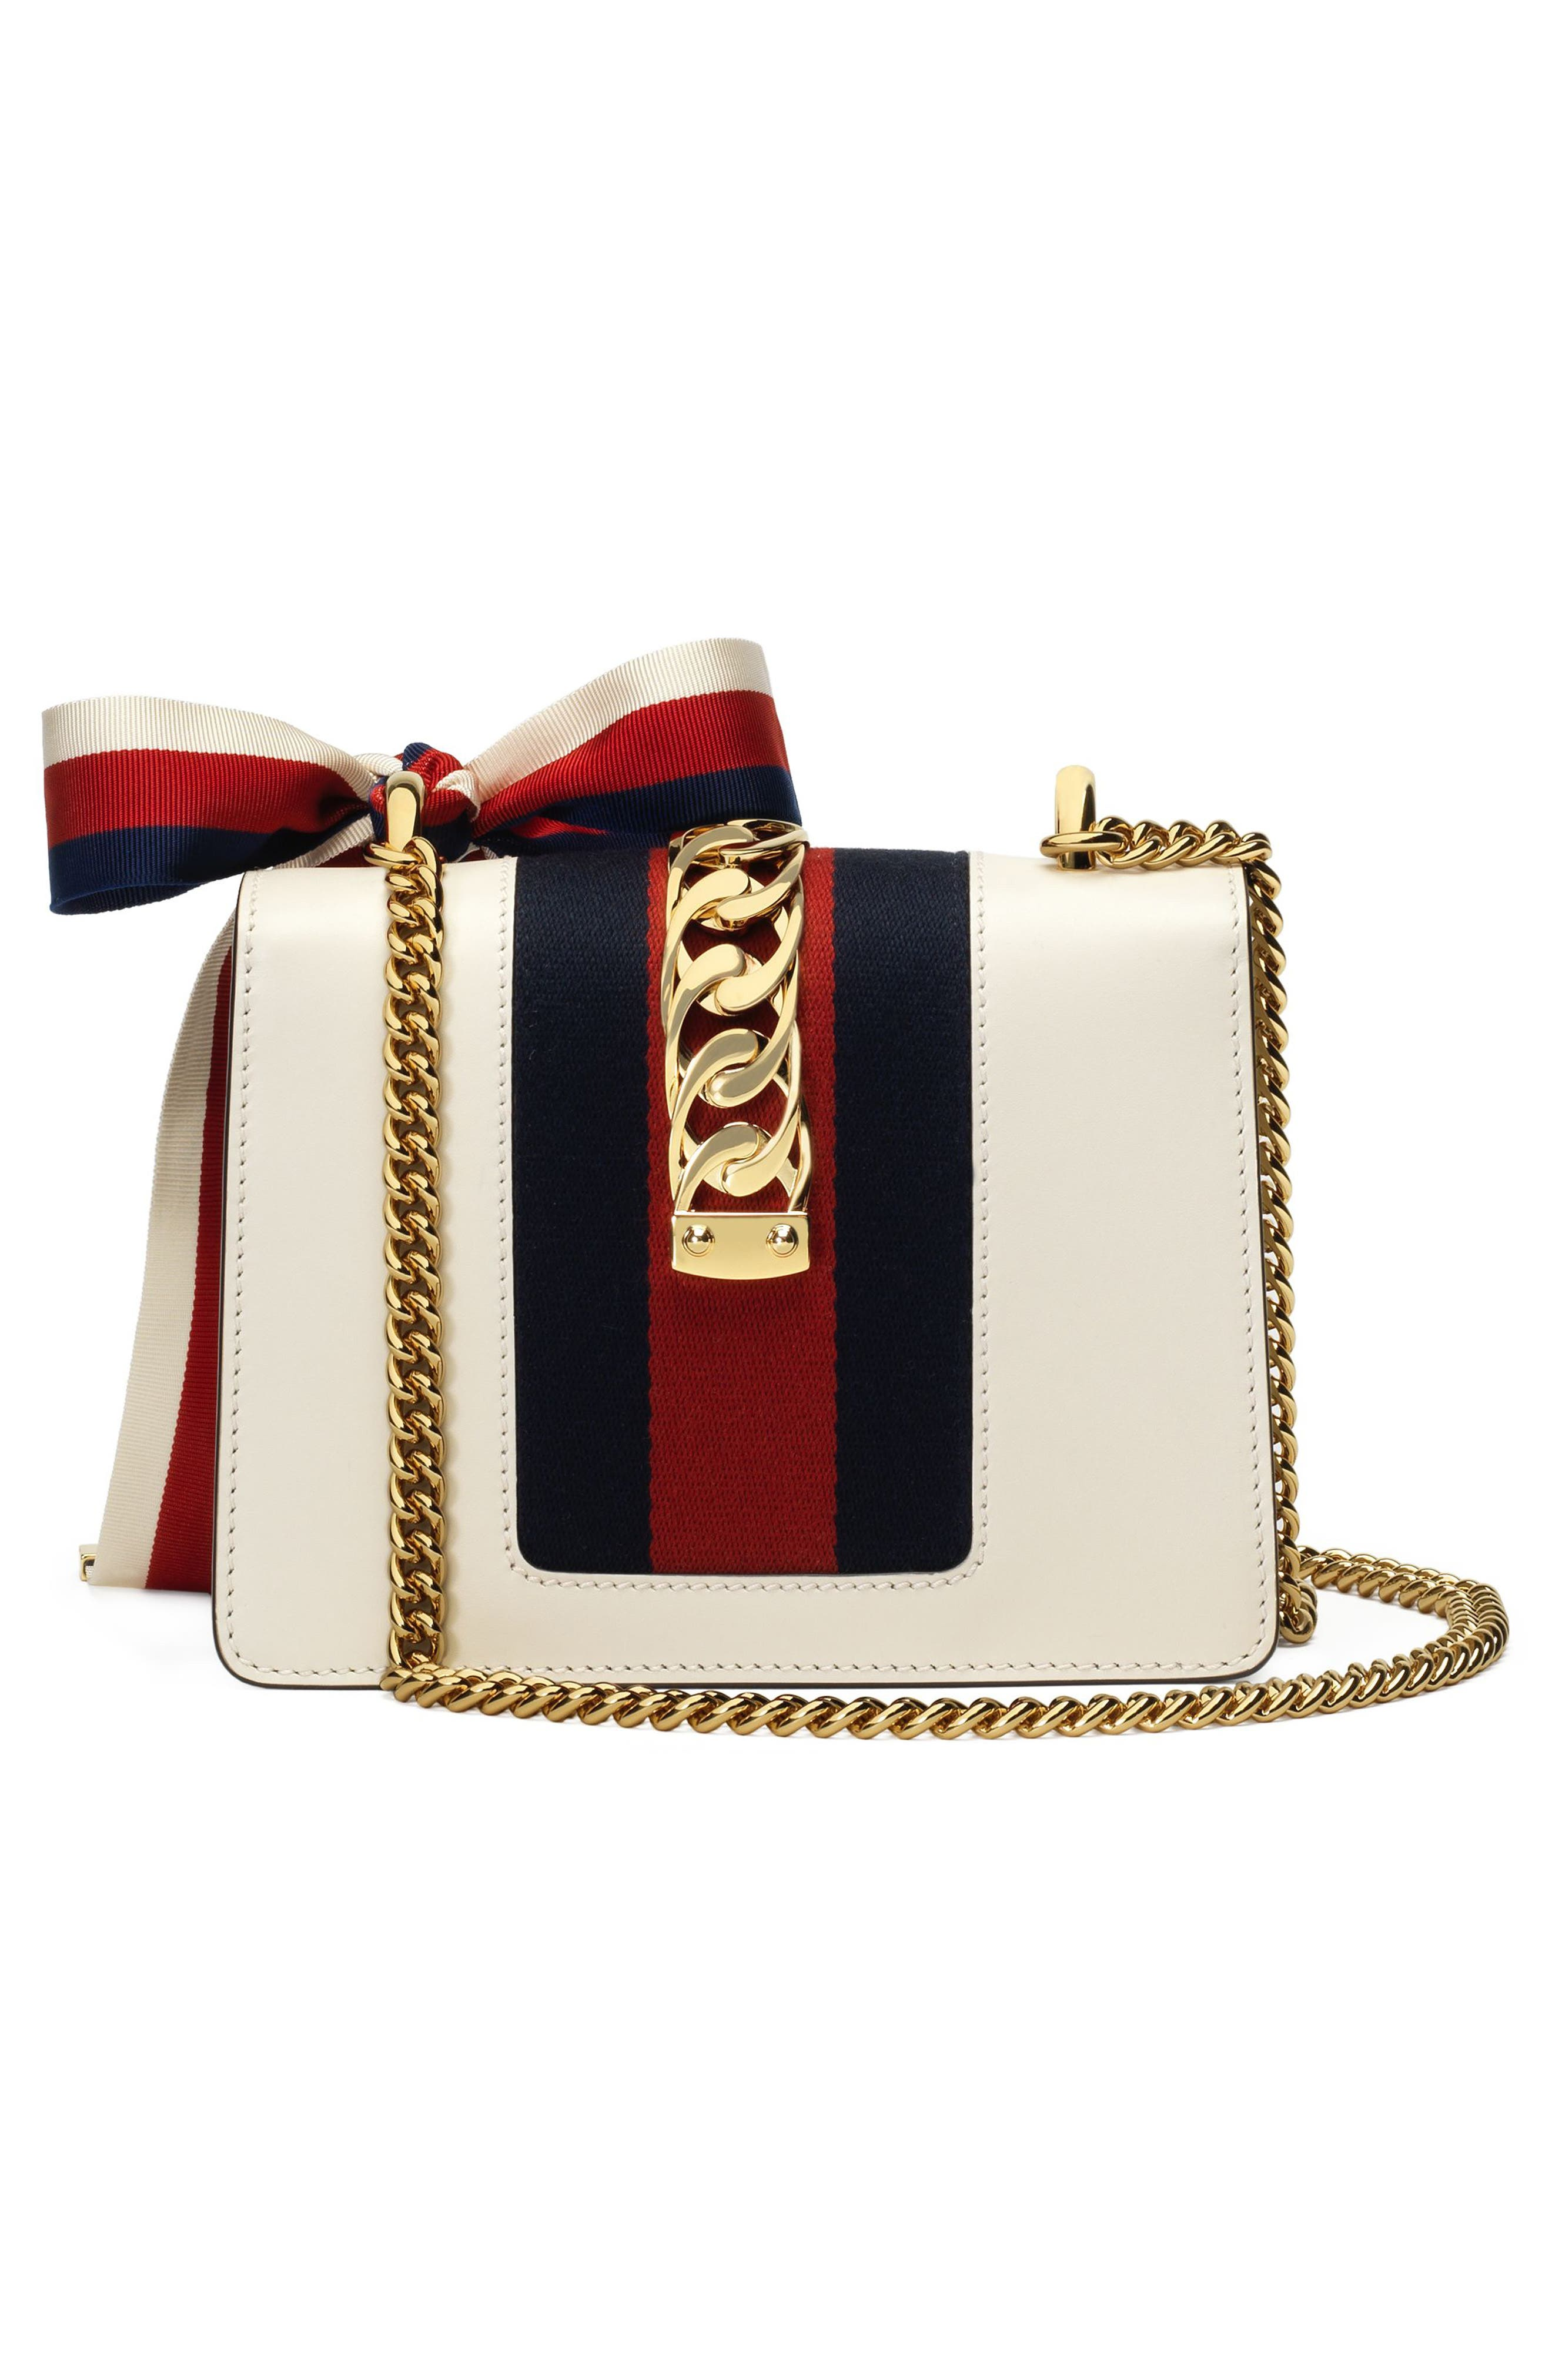 GUCCI, Mini Sylvie Leather Shoulder Bag, Alternate thumbnail 2, color, WHITE/ BLUE/ HIBISCUS RED